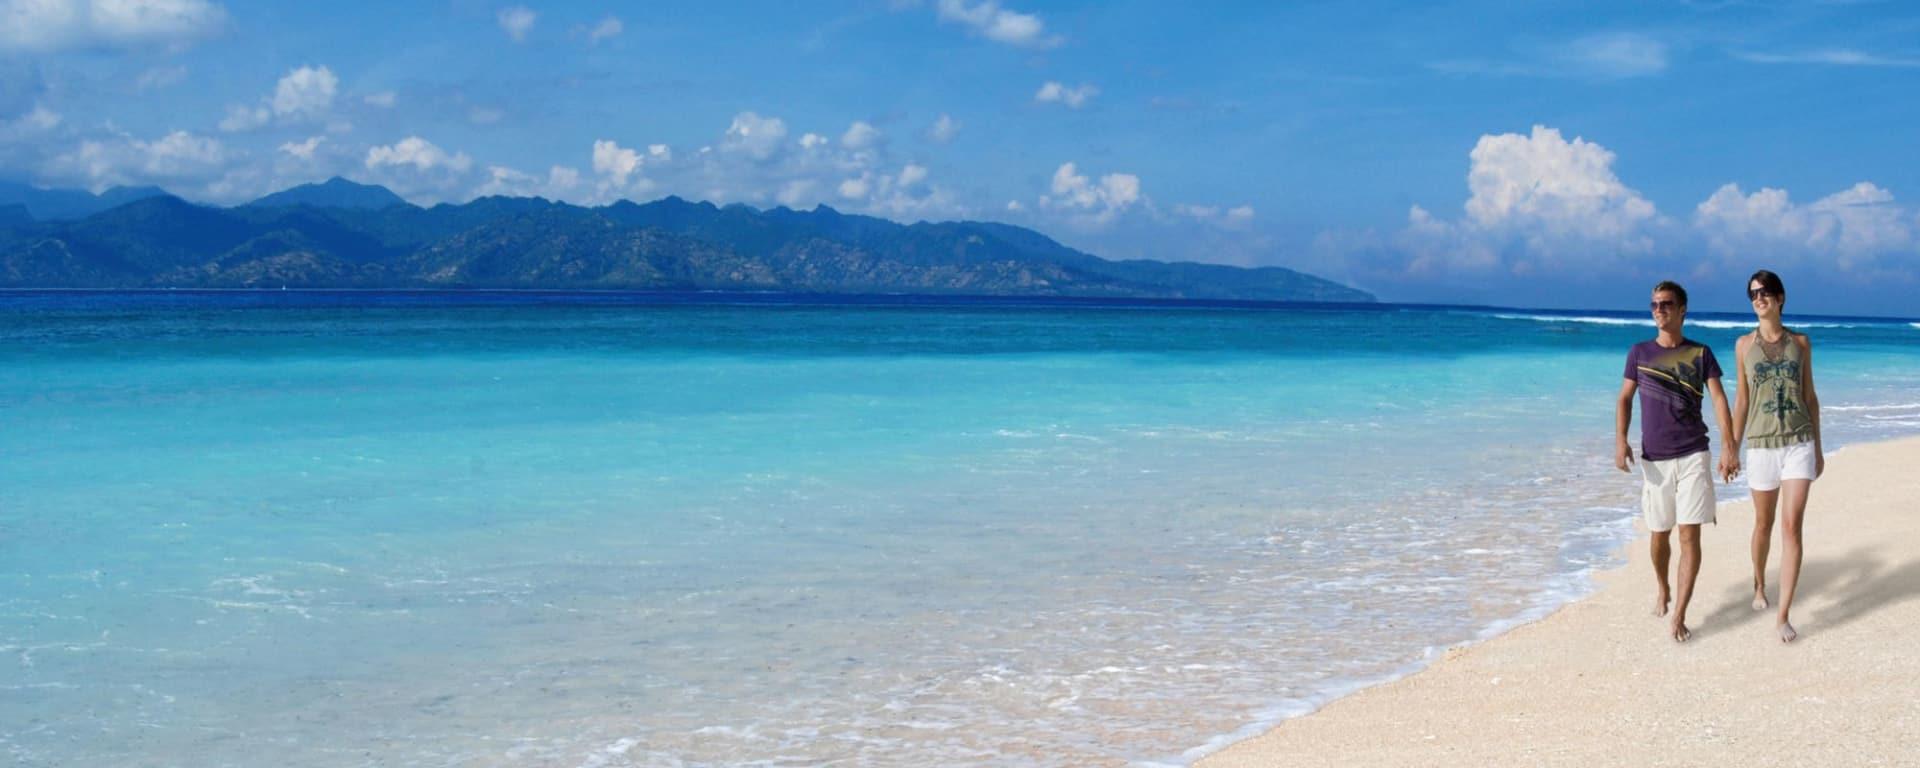 Vila Ombak à Gili: beach